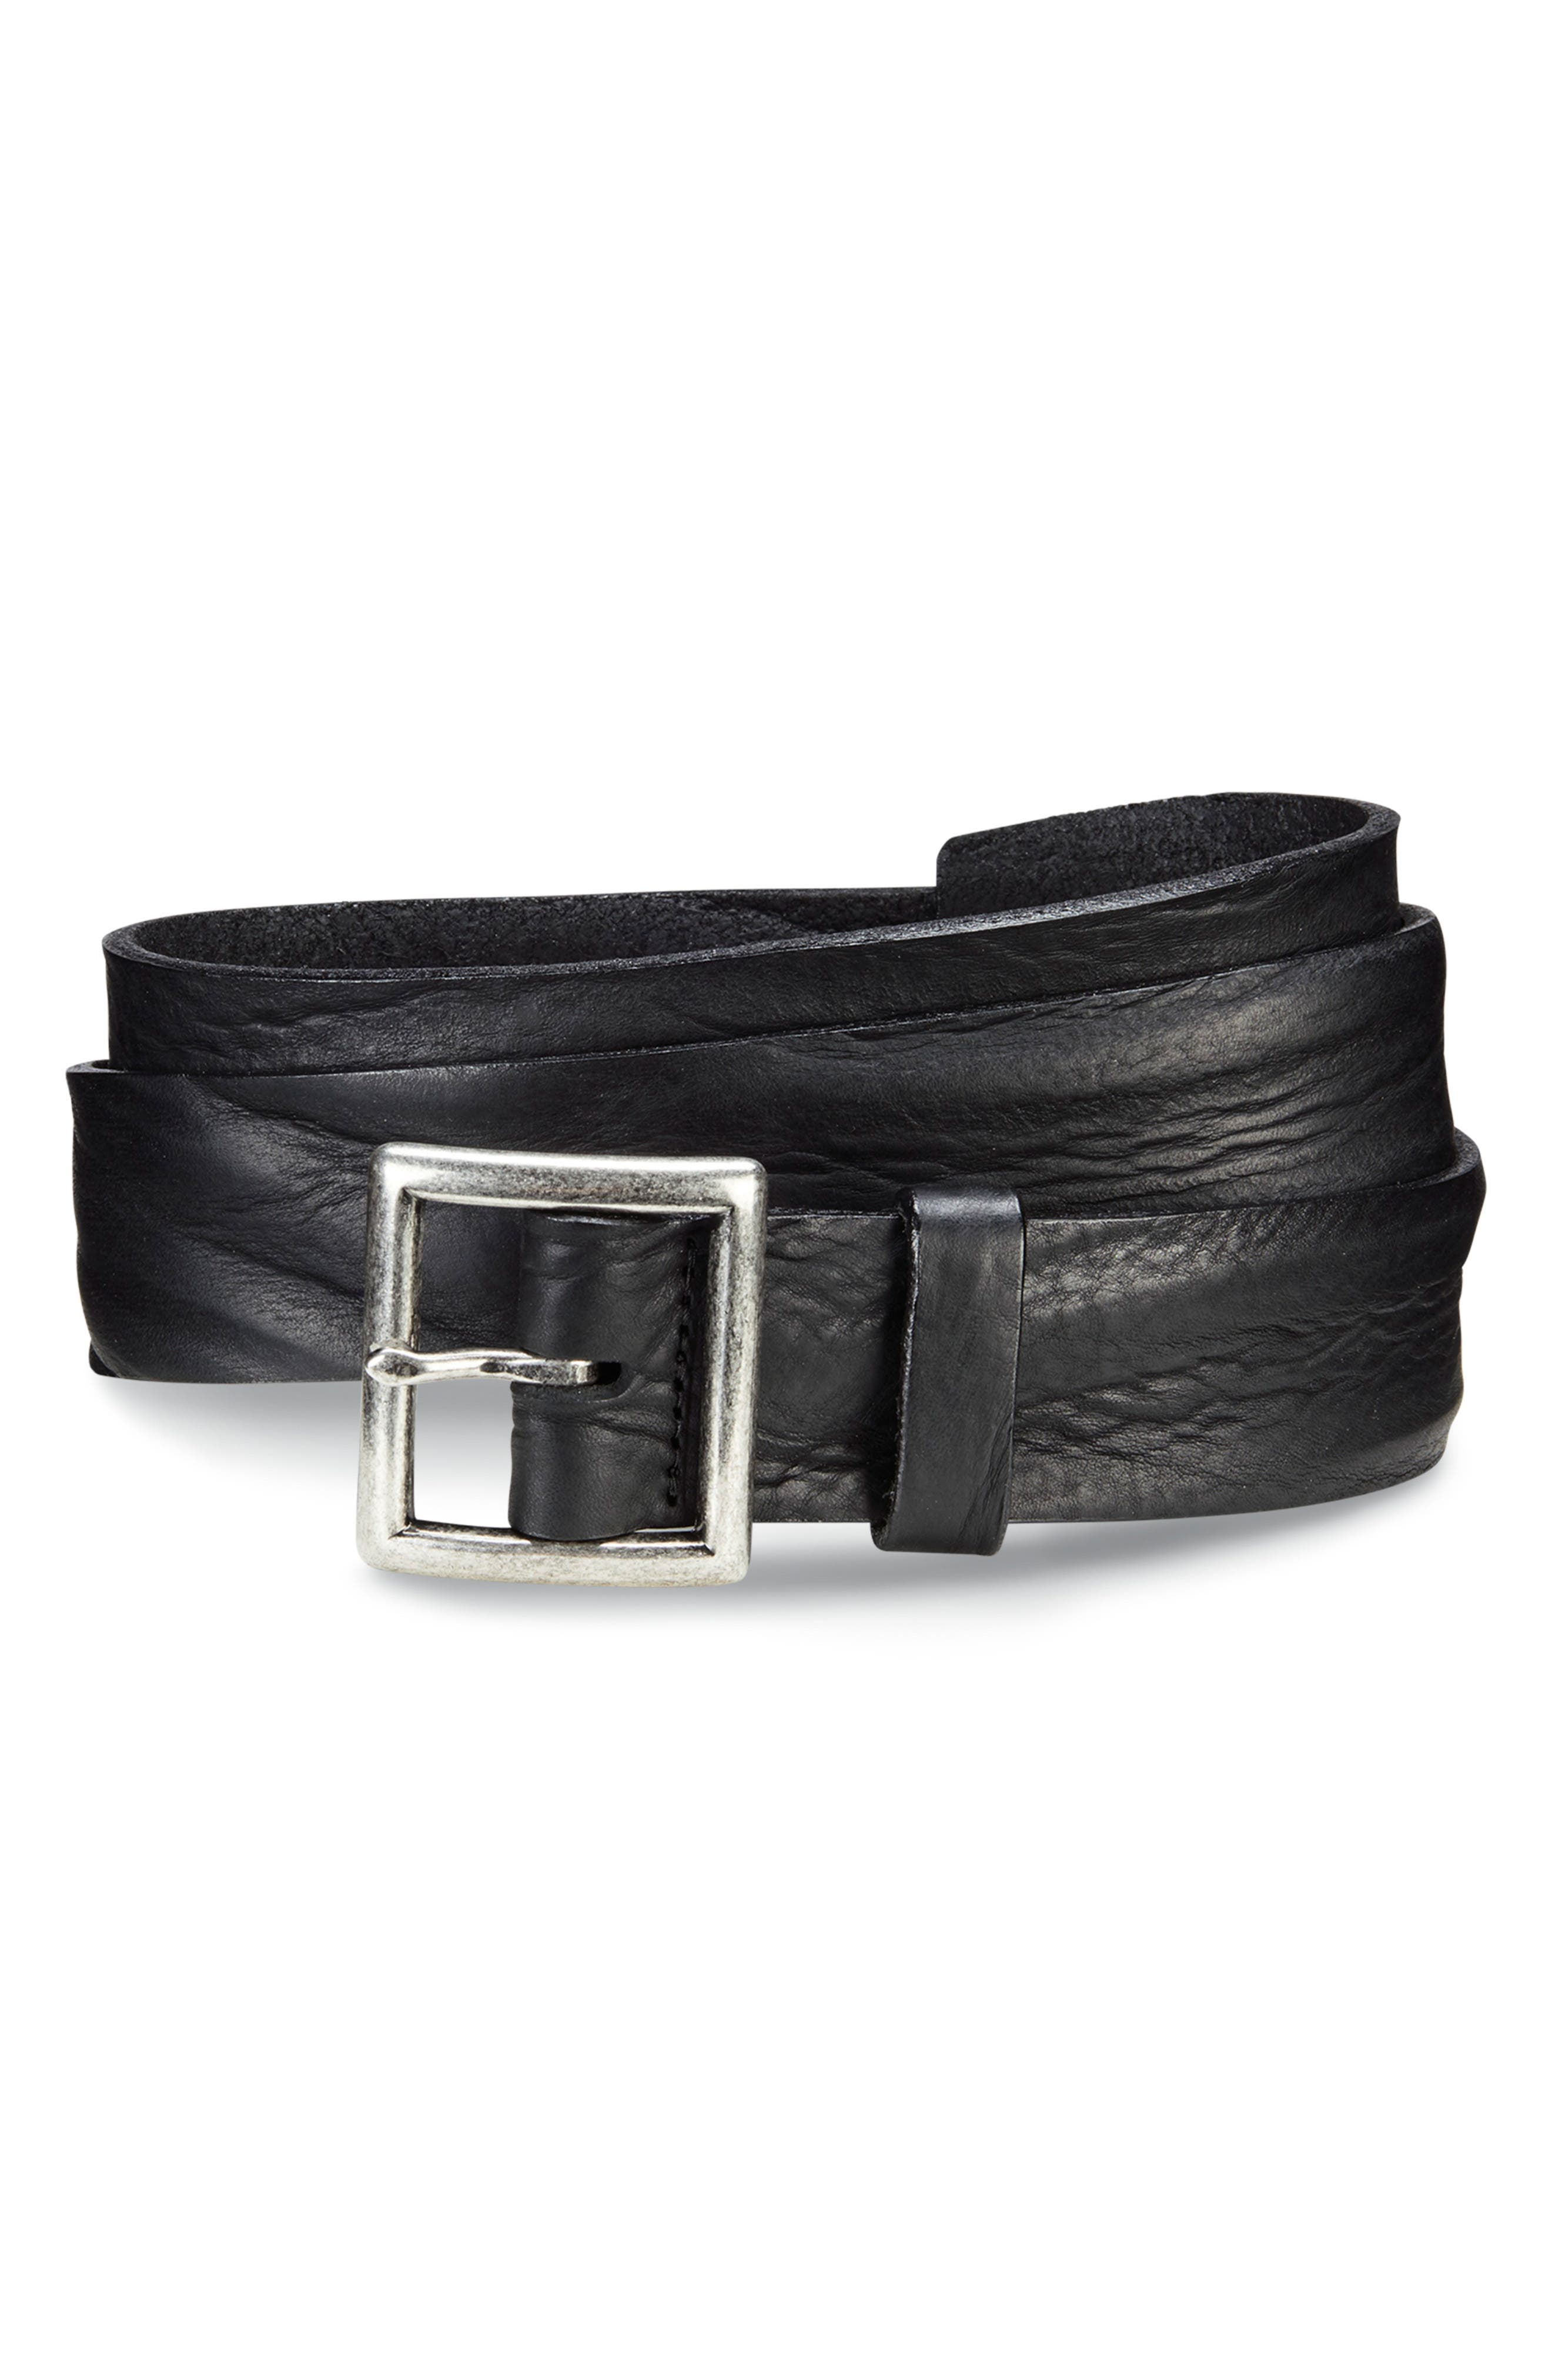 Allen Edmonds Radcliff Avenue Leather Belt, Black